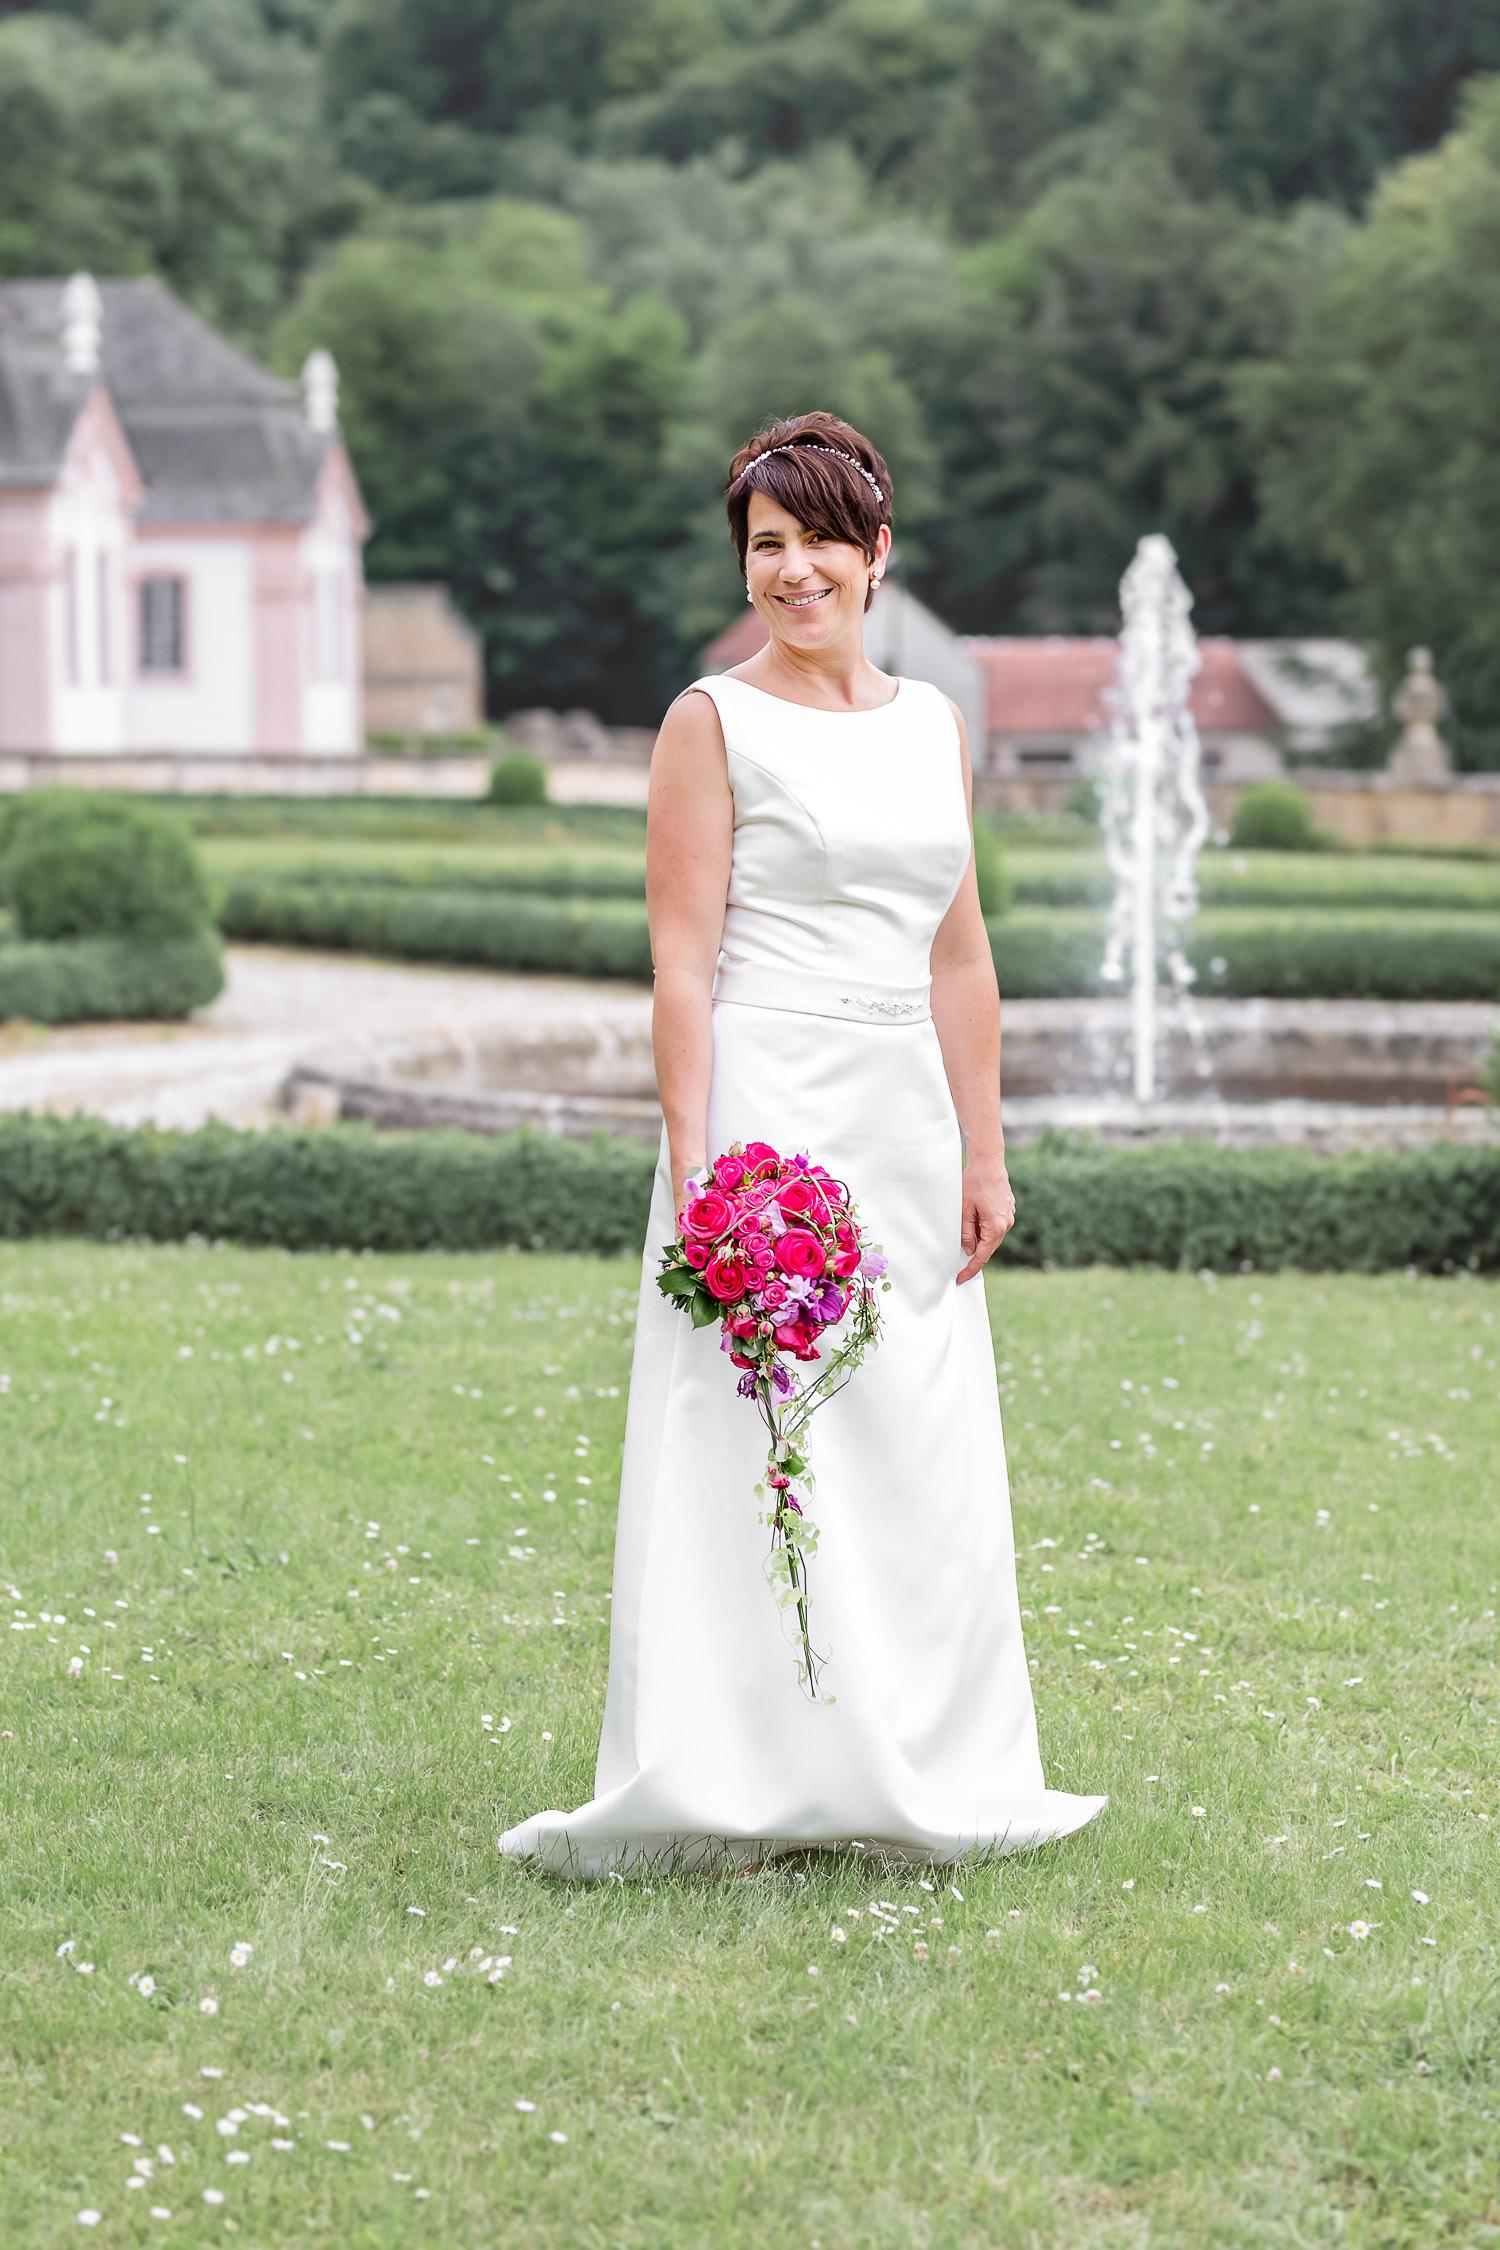 bride in the garden of the palace, Schloss Weilerbach, Hochzeit, Wedding, Andrea Schenke Photography